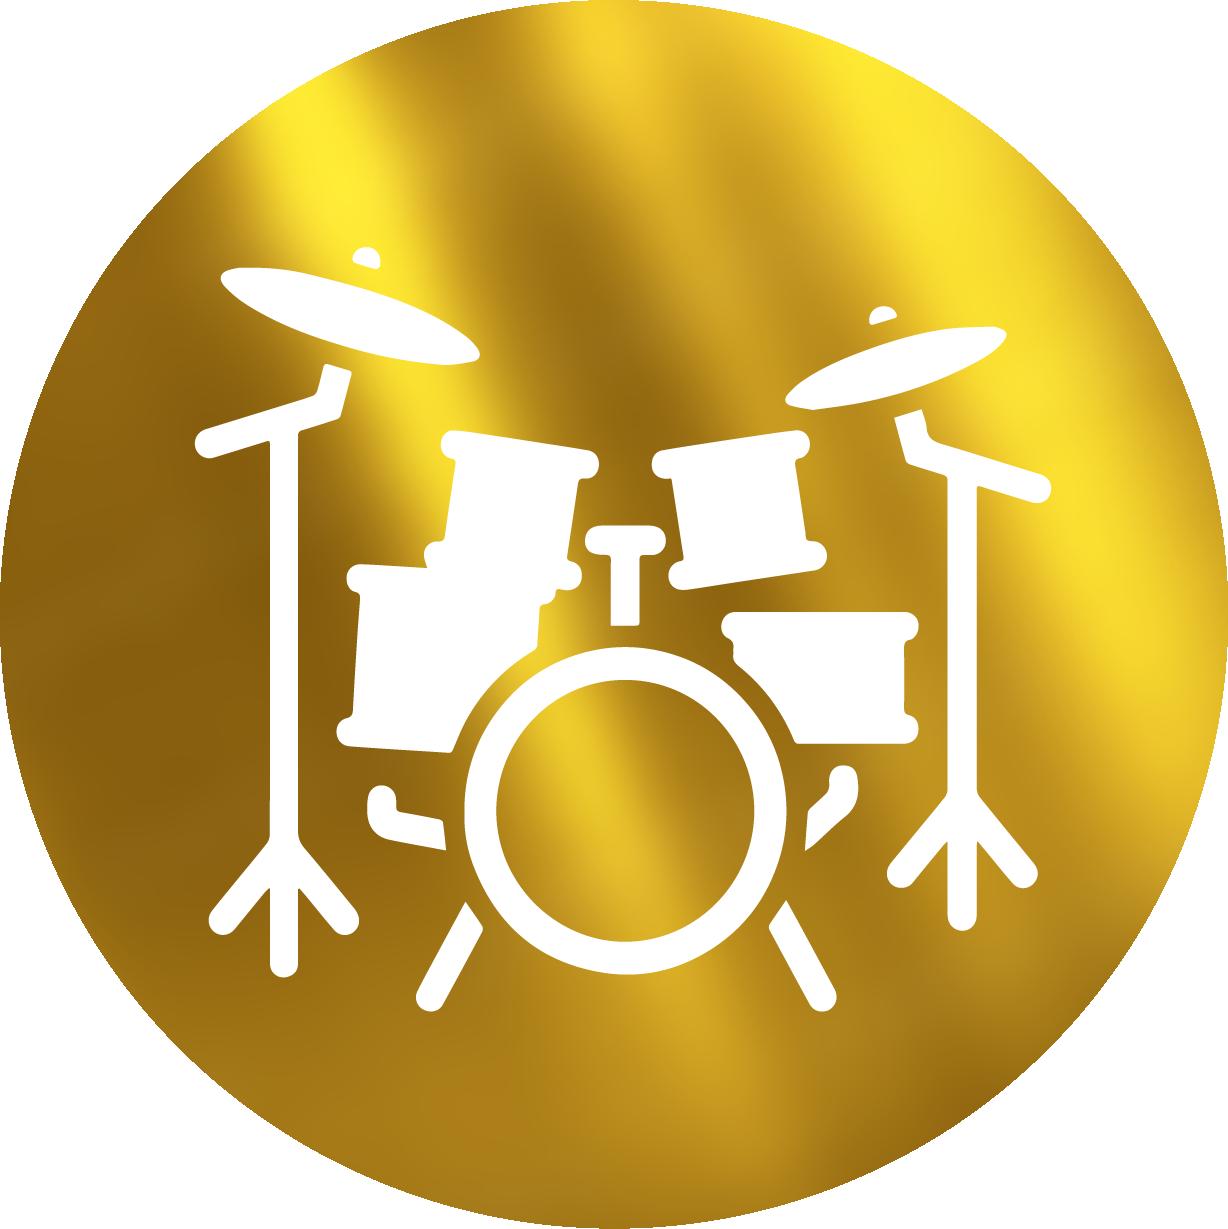 Cloverleaf_Membership Website_Icons_Square-03.png